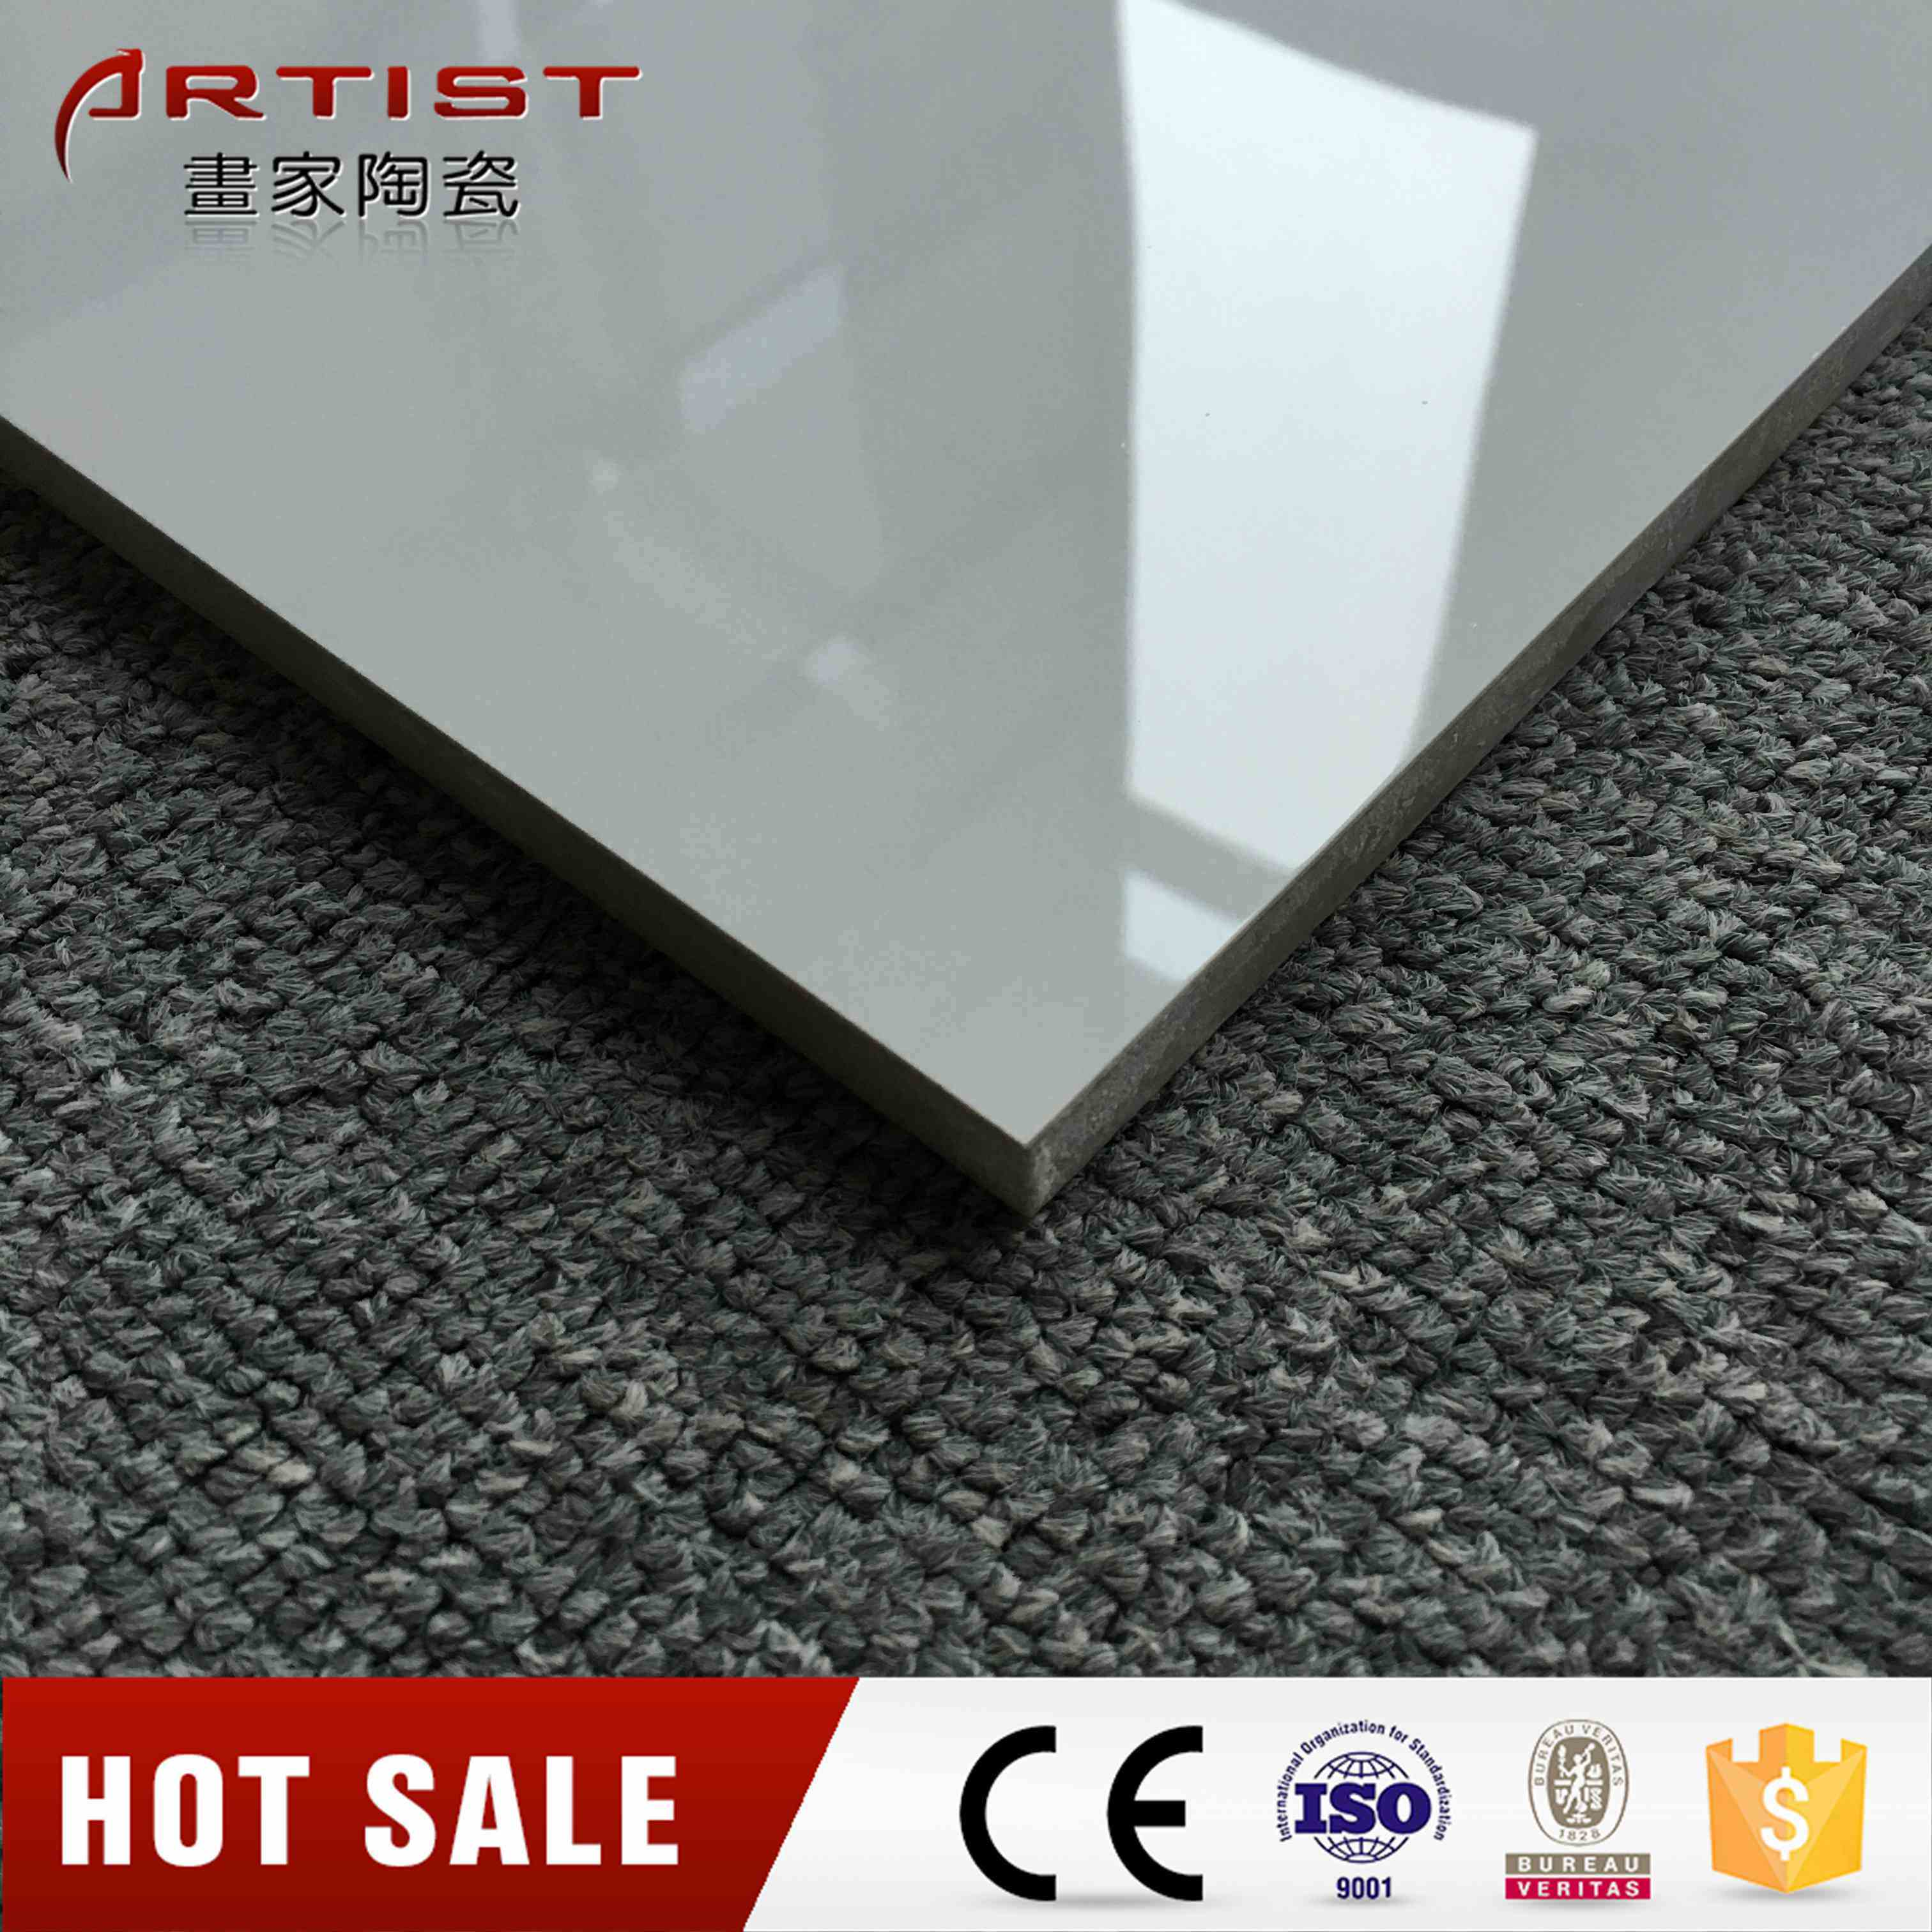 Marble Look 600X600mm, 800X800mm Glazed Polished Porcelain Floor Tiles